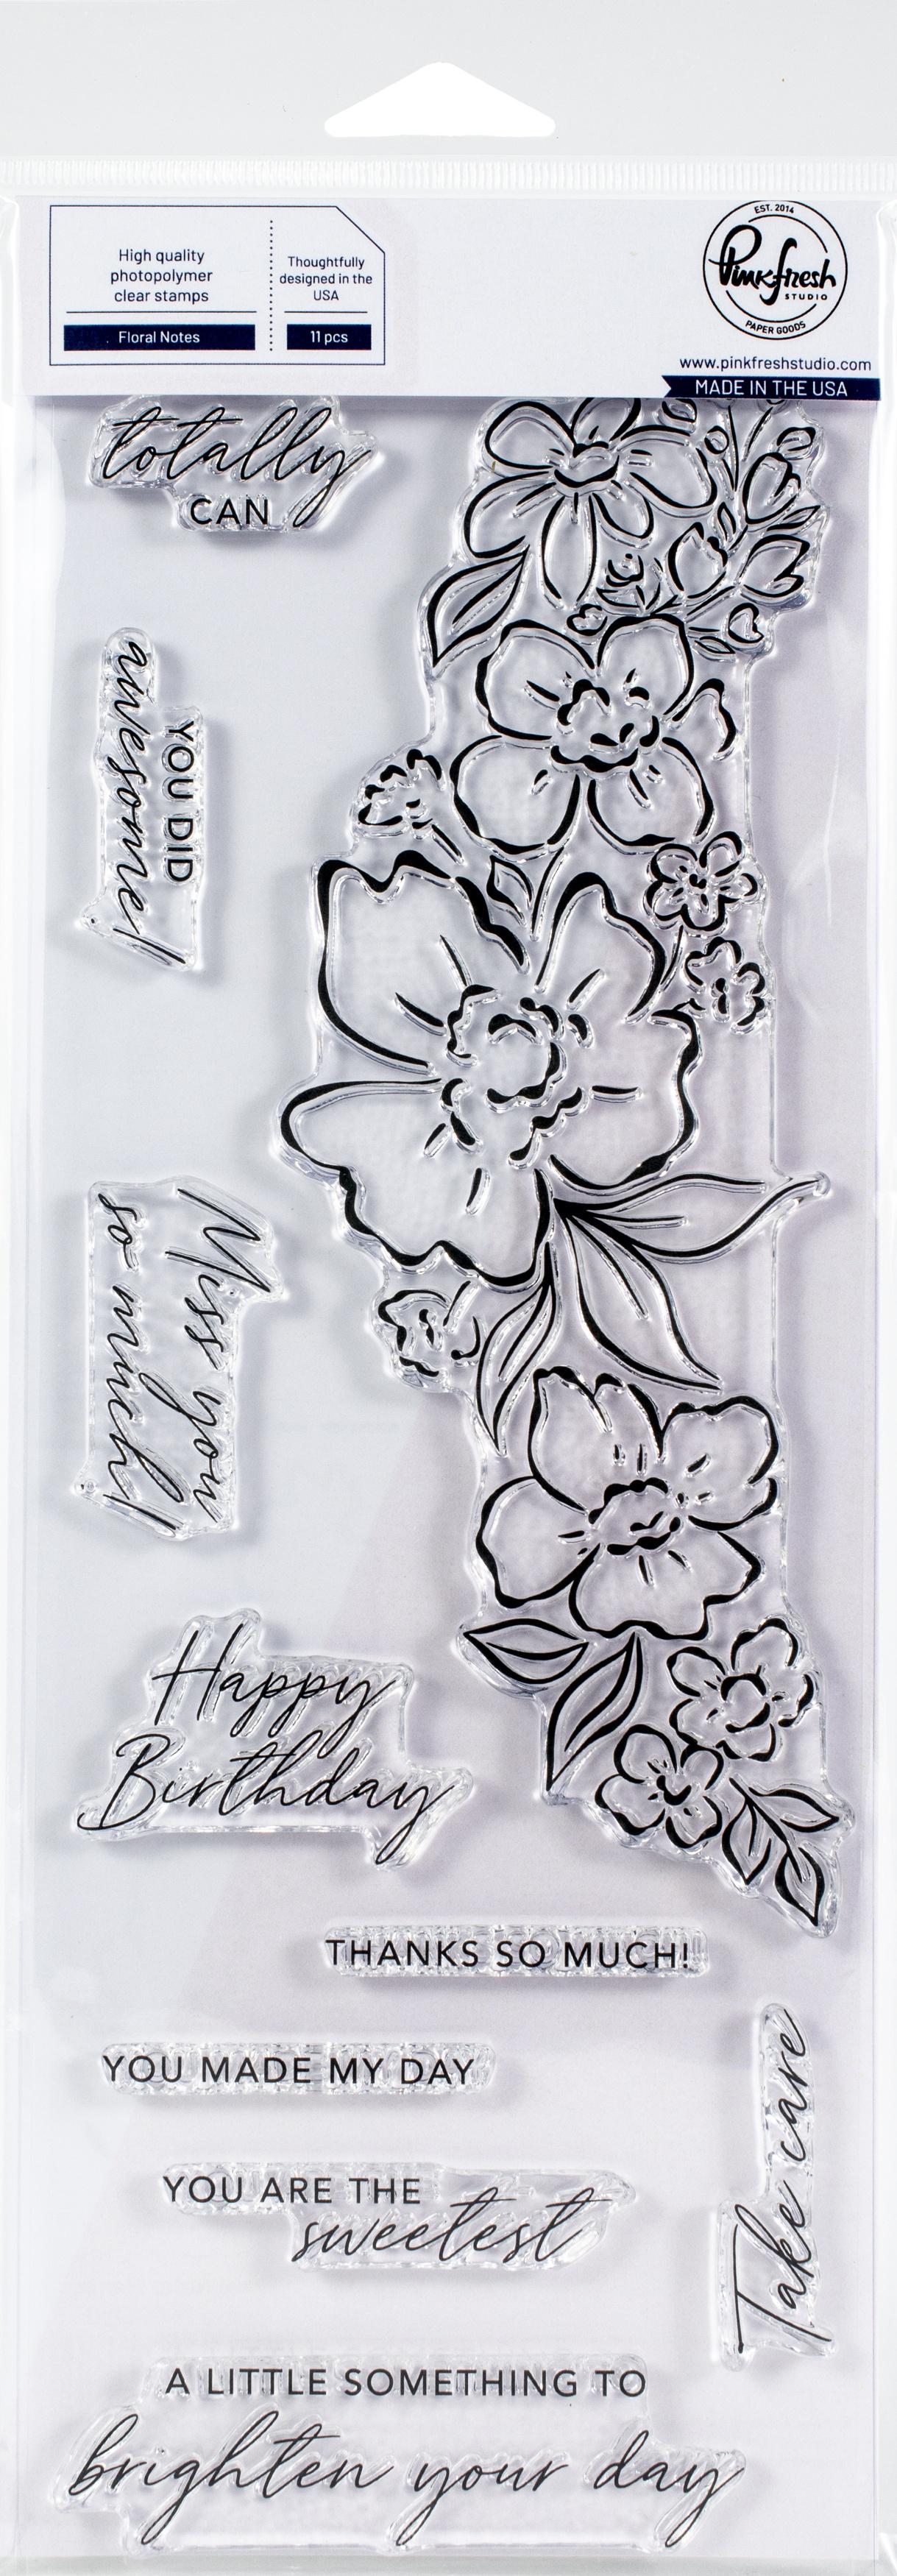 Pinkfresh Studio Clear Slimline Stamp Set 4X12-Floral Notes